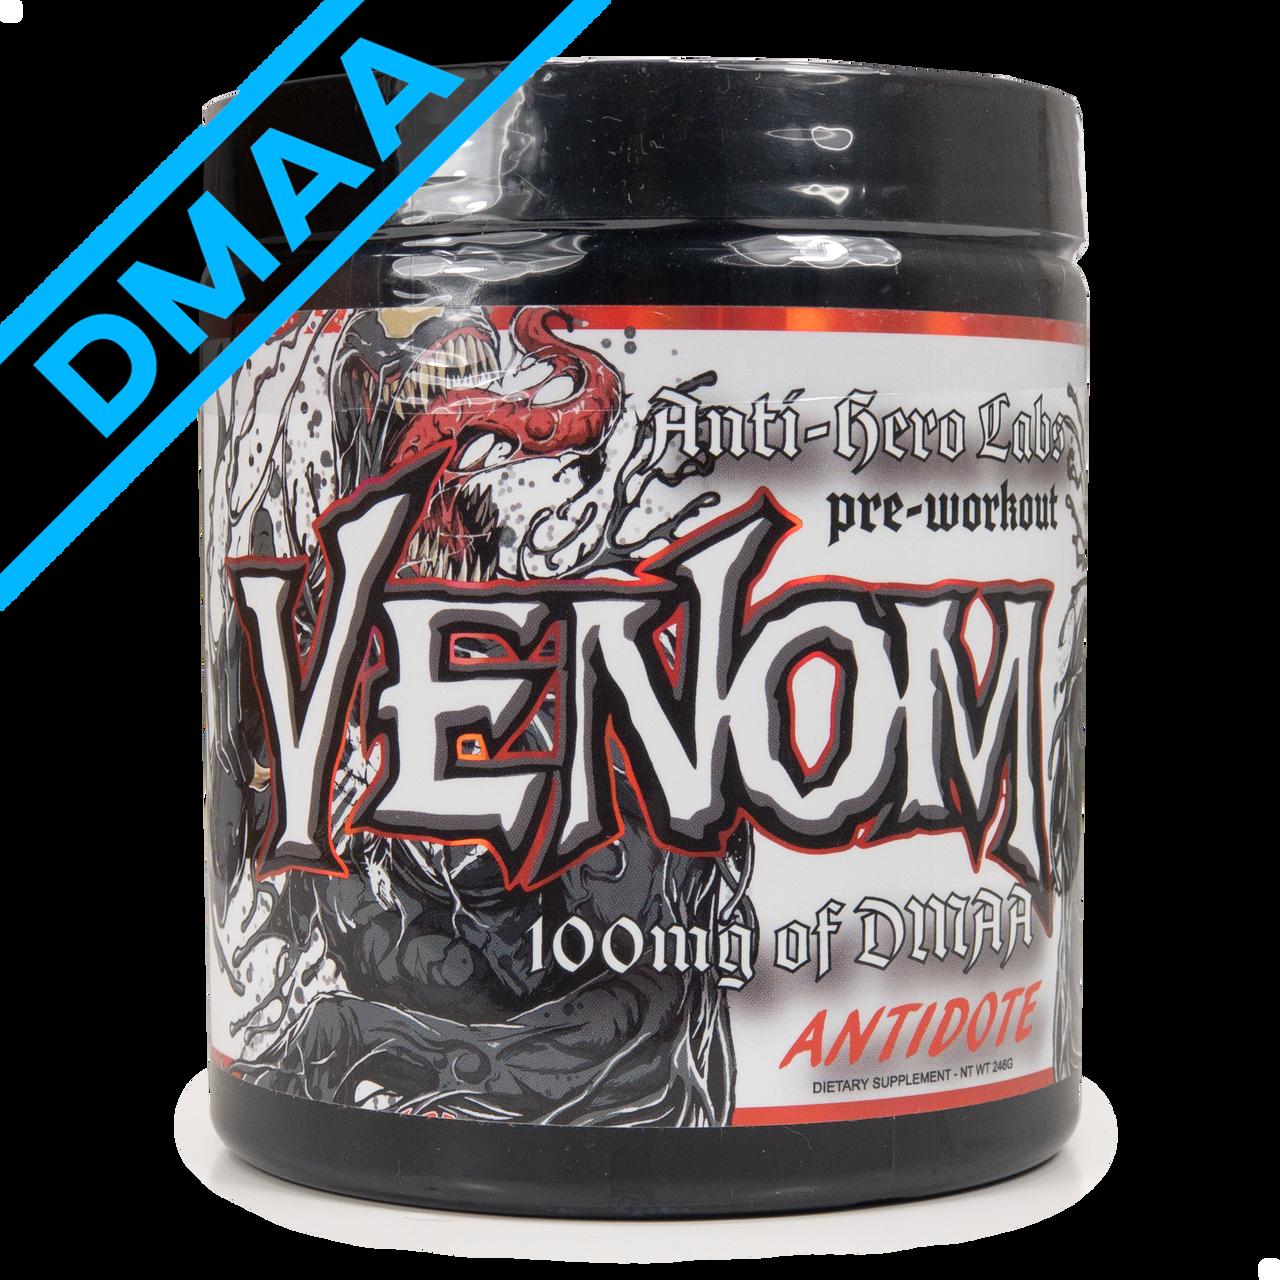 Venom with DMAA